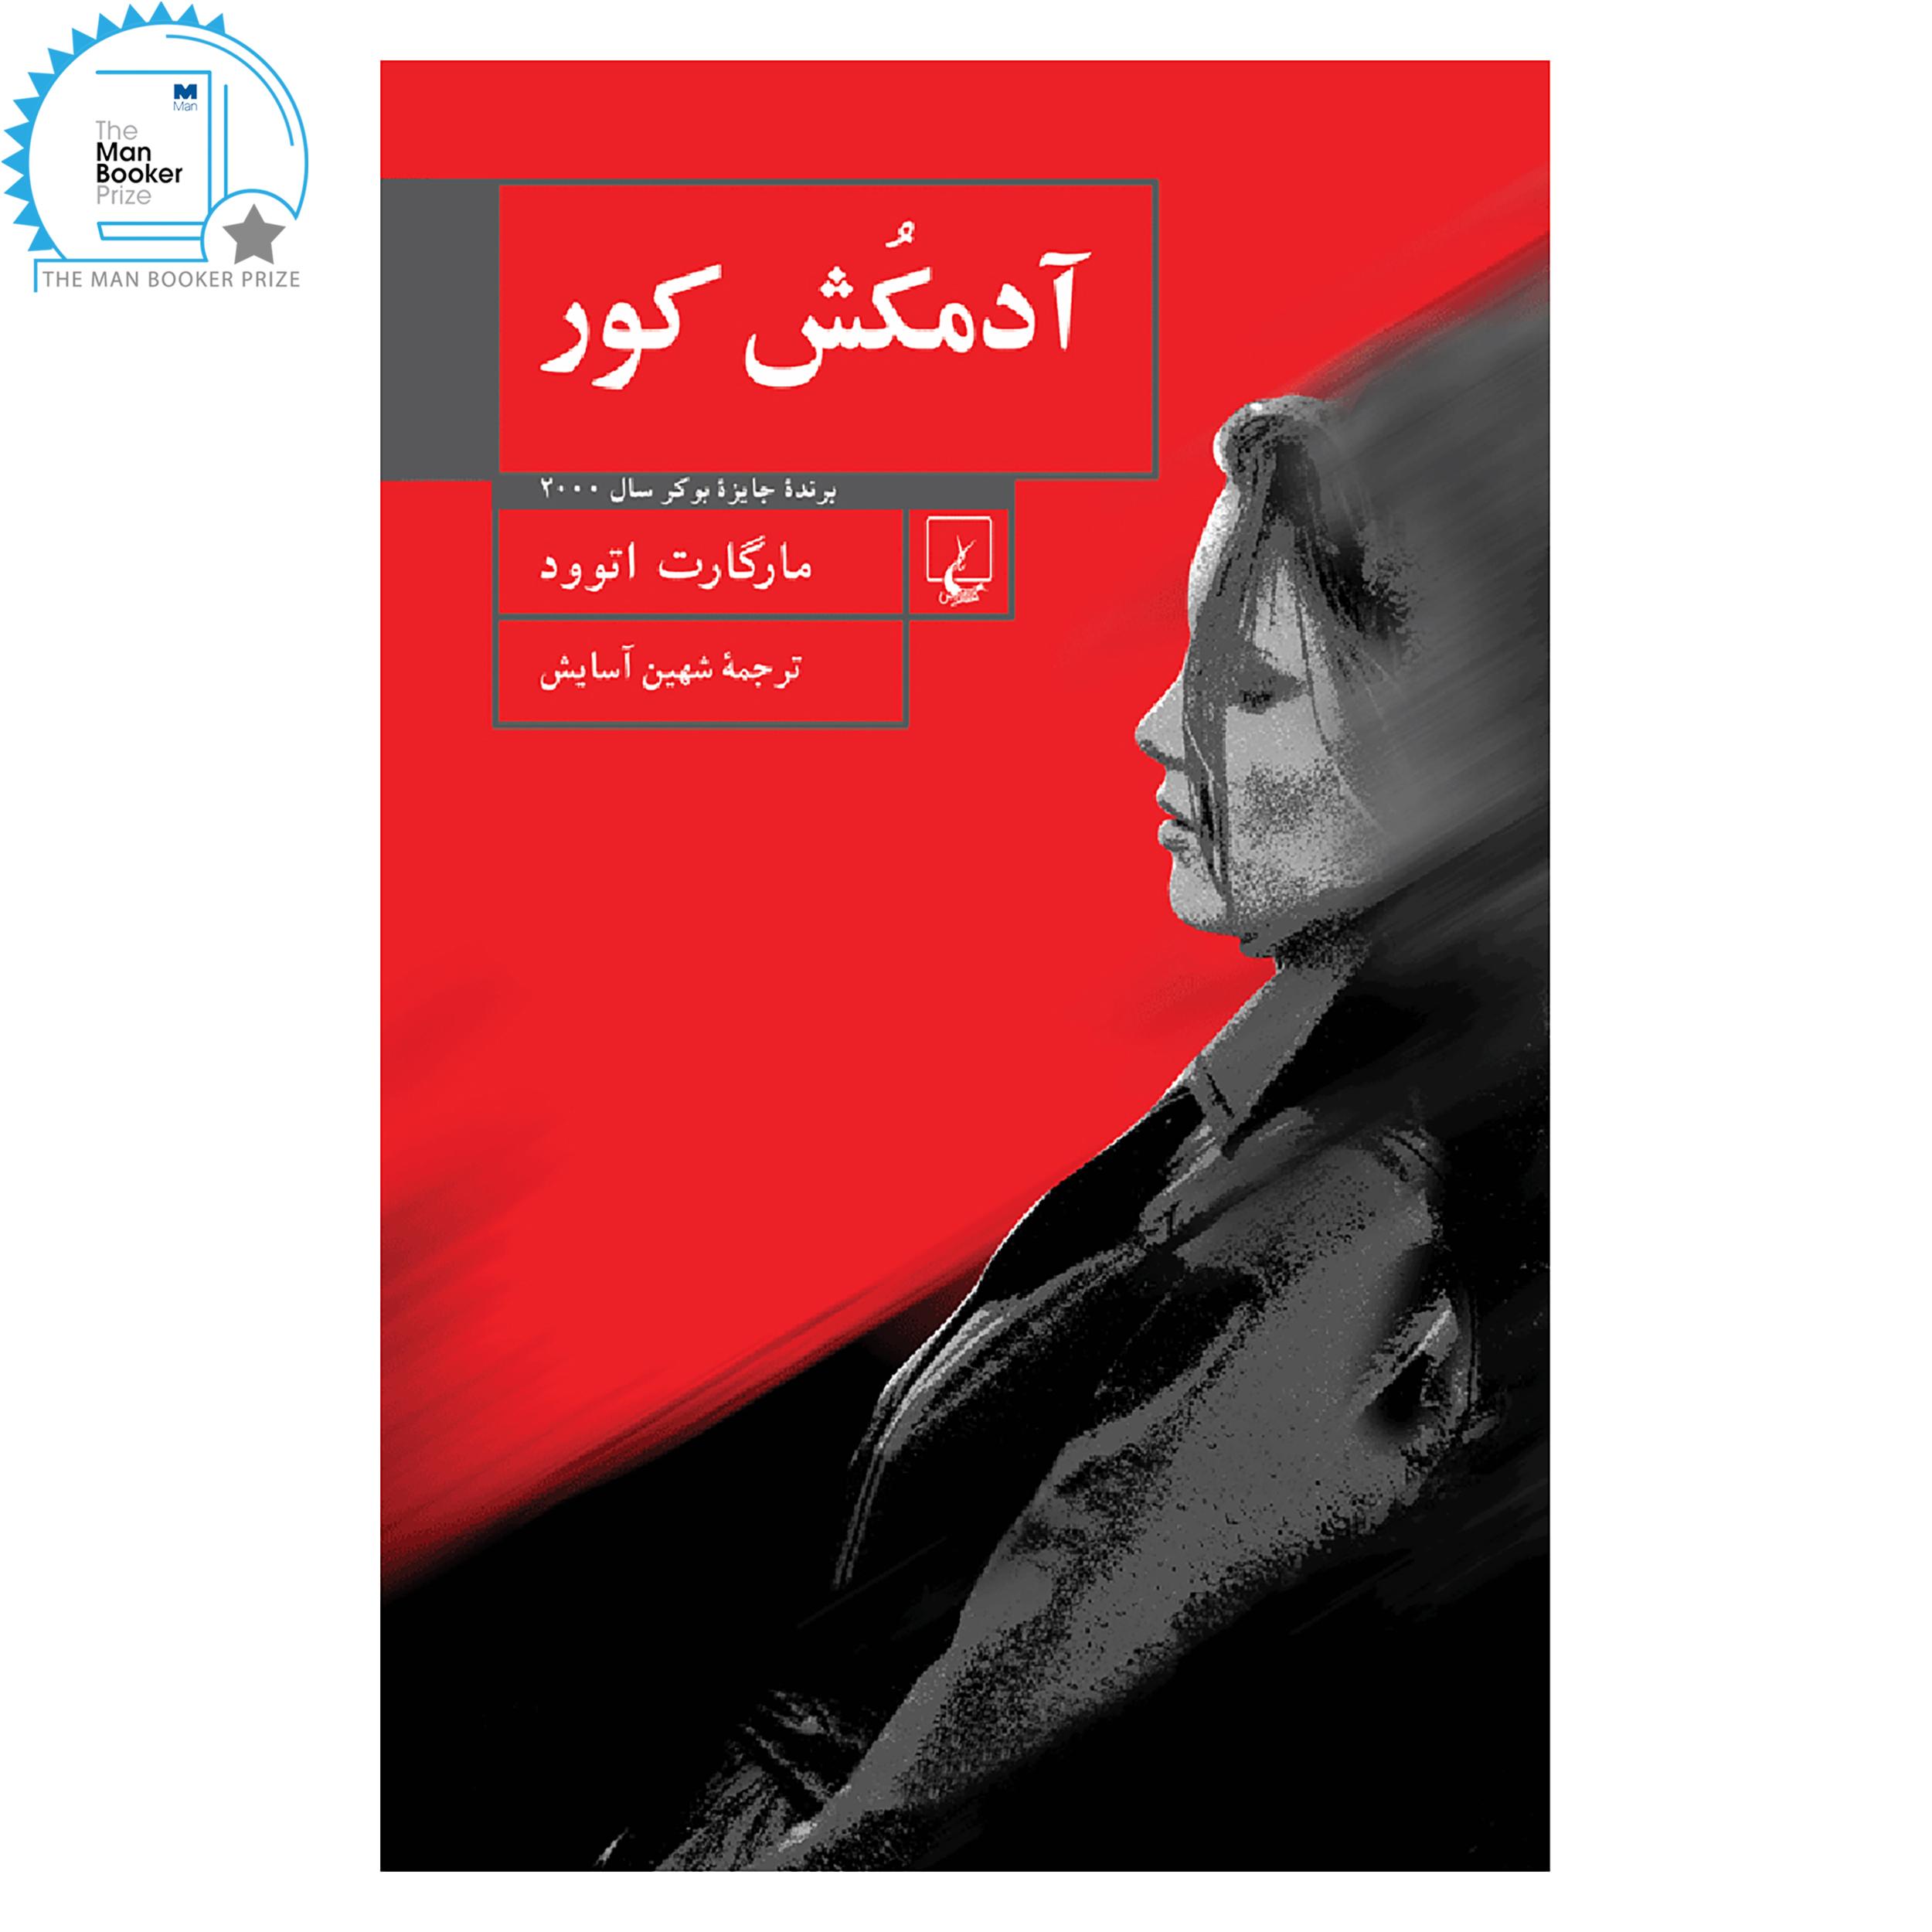 کتاب آدمکش کور اثر مارگارت اتوود نشر ققنوس